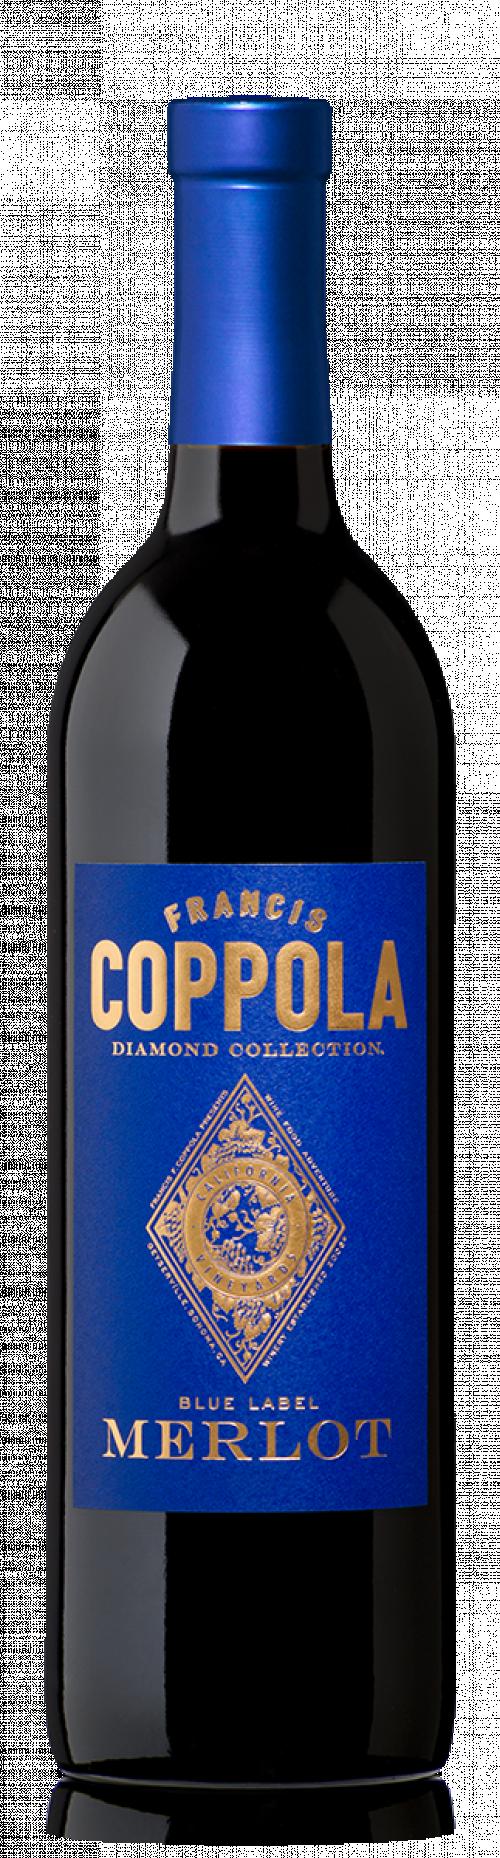 2017 Coppola Merlot 750ml